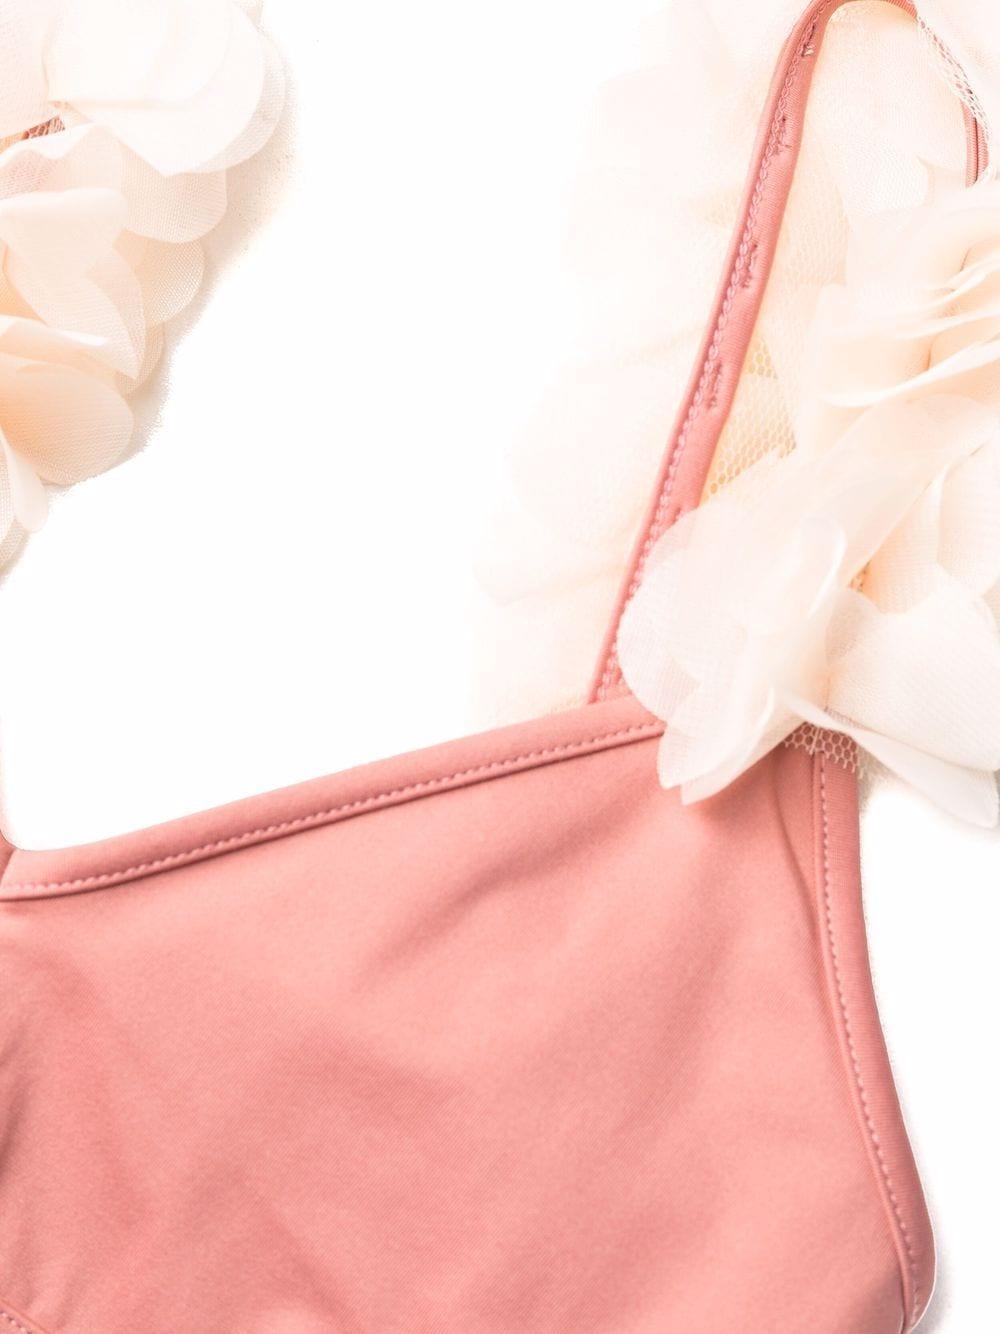 Old rose Aisha bikini featuring white floral detail LA REVECHE |  | AISHA HWOLD ROSE